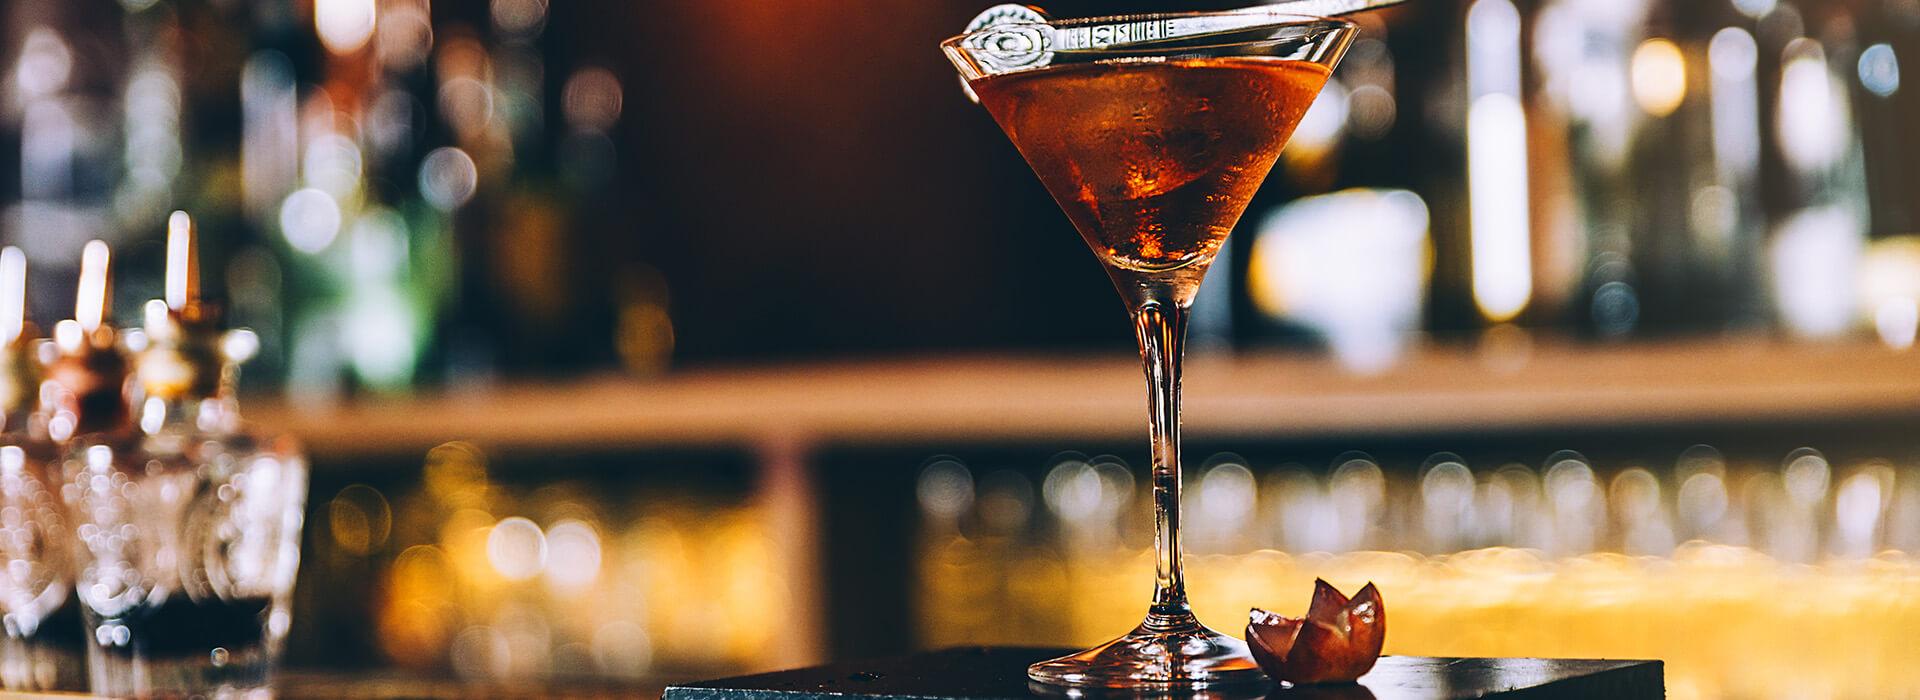 Cocktails-slider -thegreenmanbar-Bruxelles